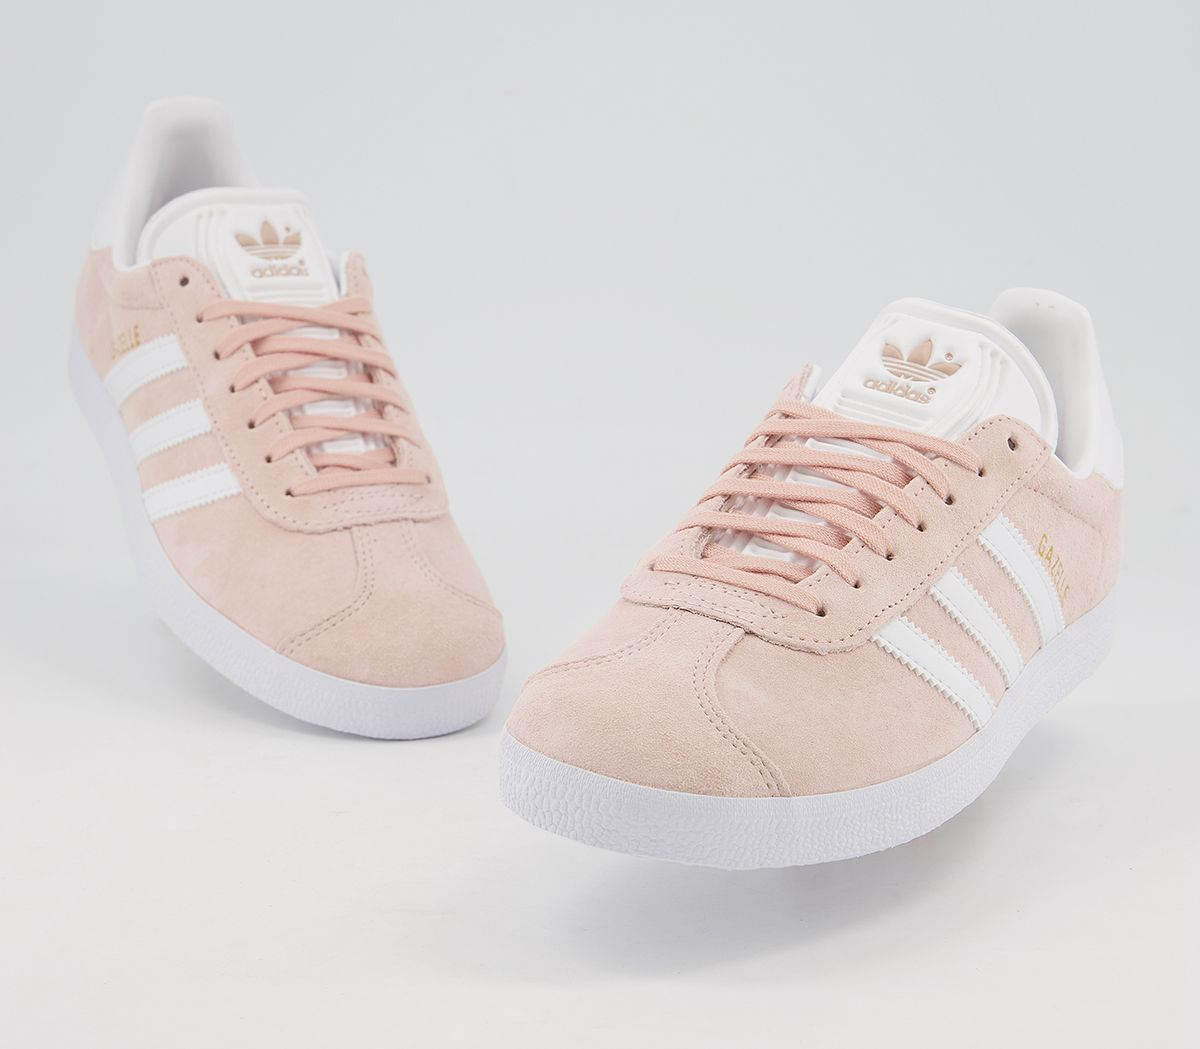 big sale f317c f94c9 adidas Gazelle Vapour Pink White - His trainers